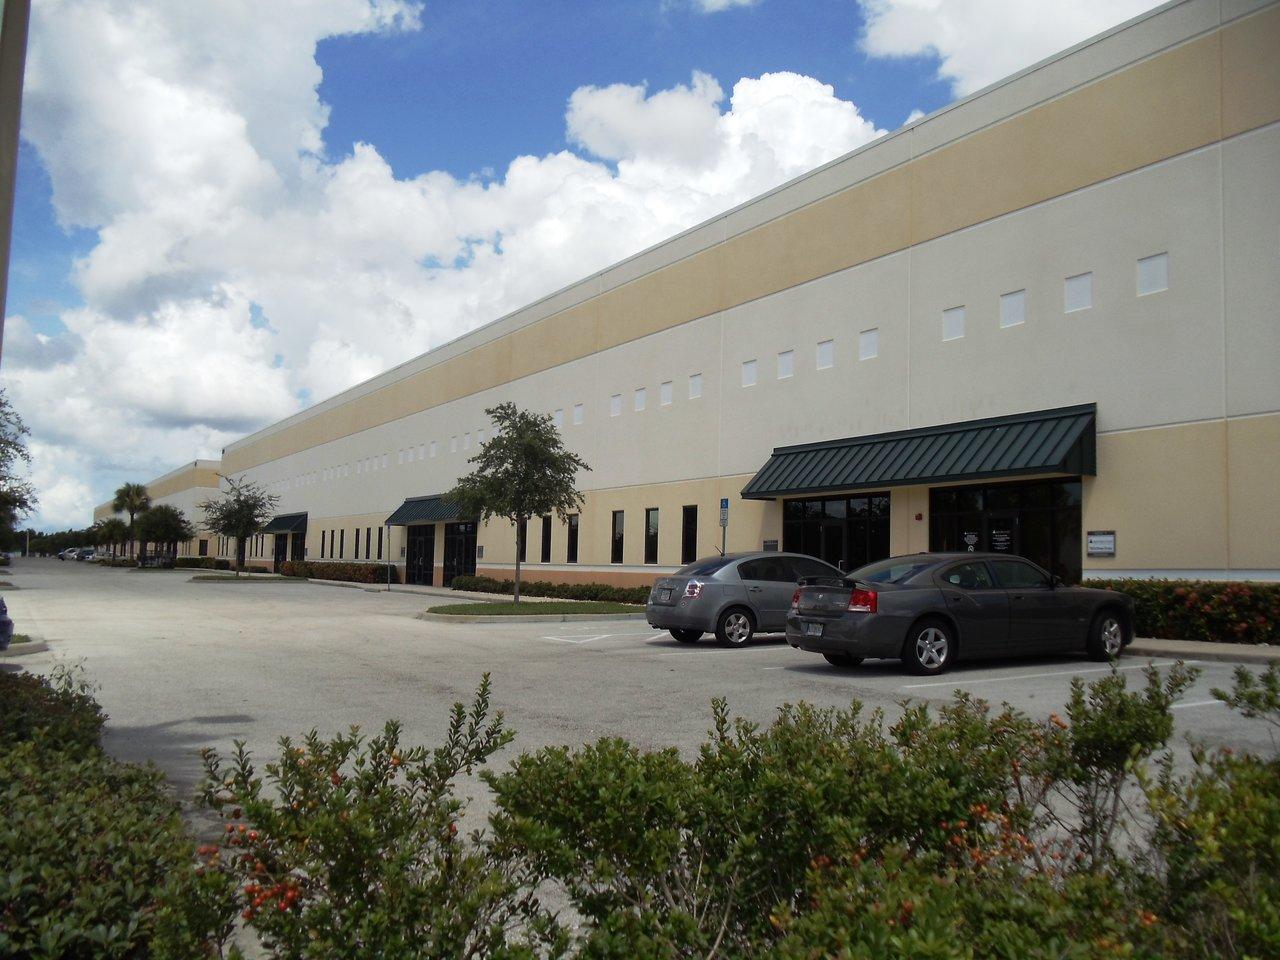 7874 Drew Cir, Fort Myers, FL, 33967